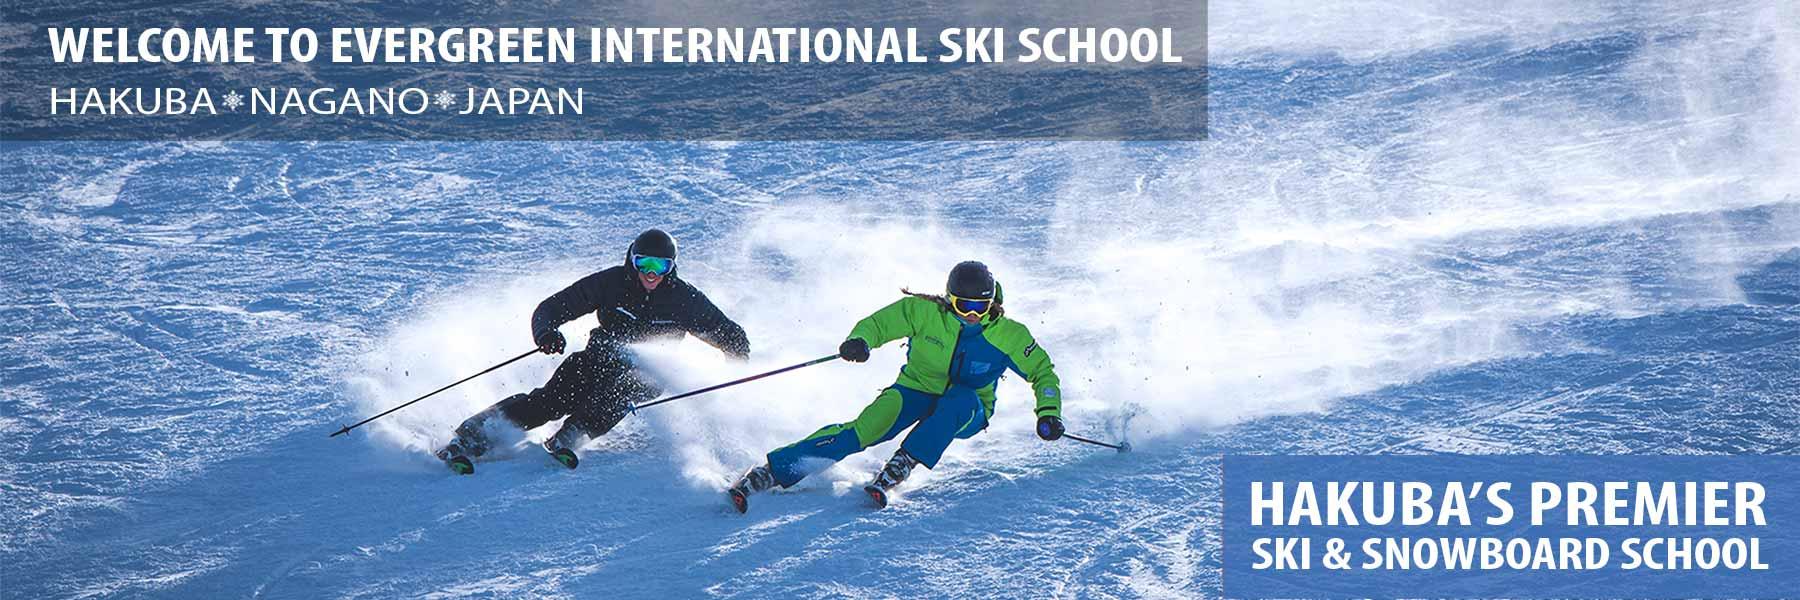 japan ski school header - private ski lessons